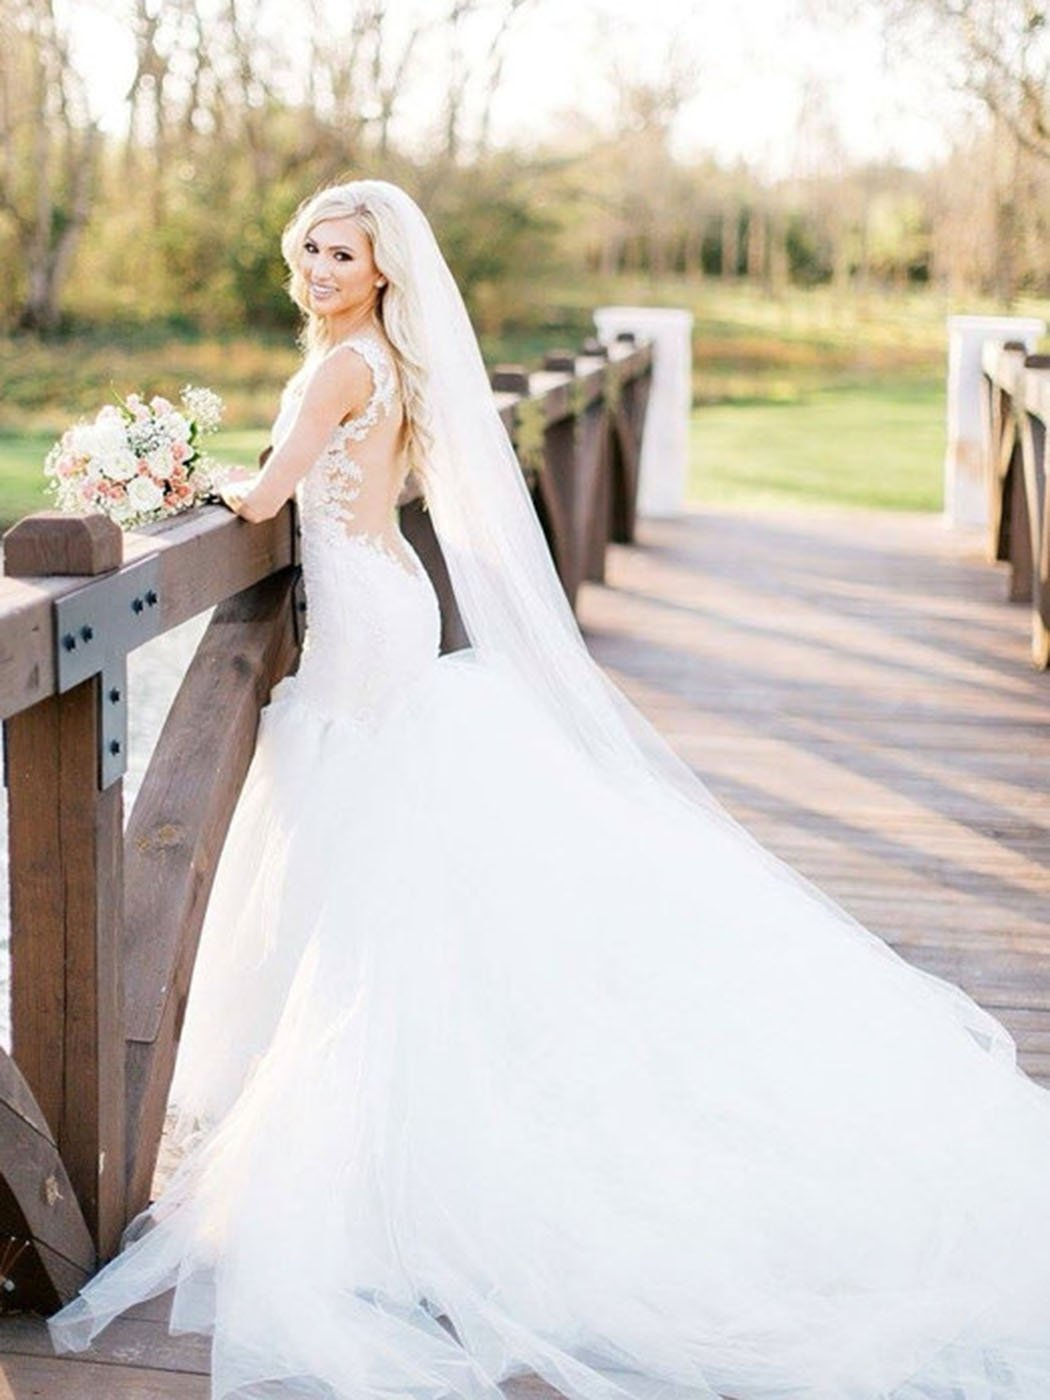 Barogirl Wedding Veil Comb Bridal Cathedral Veil 1 Tier Drop Veil Wedding Rhinestones Hair Comb For Brides 118 Inches White